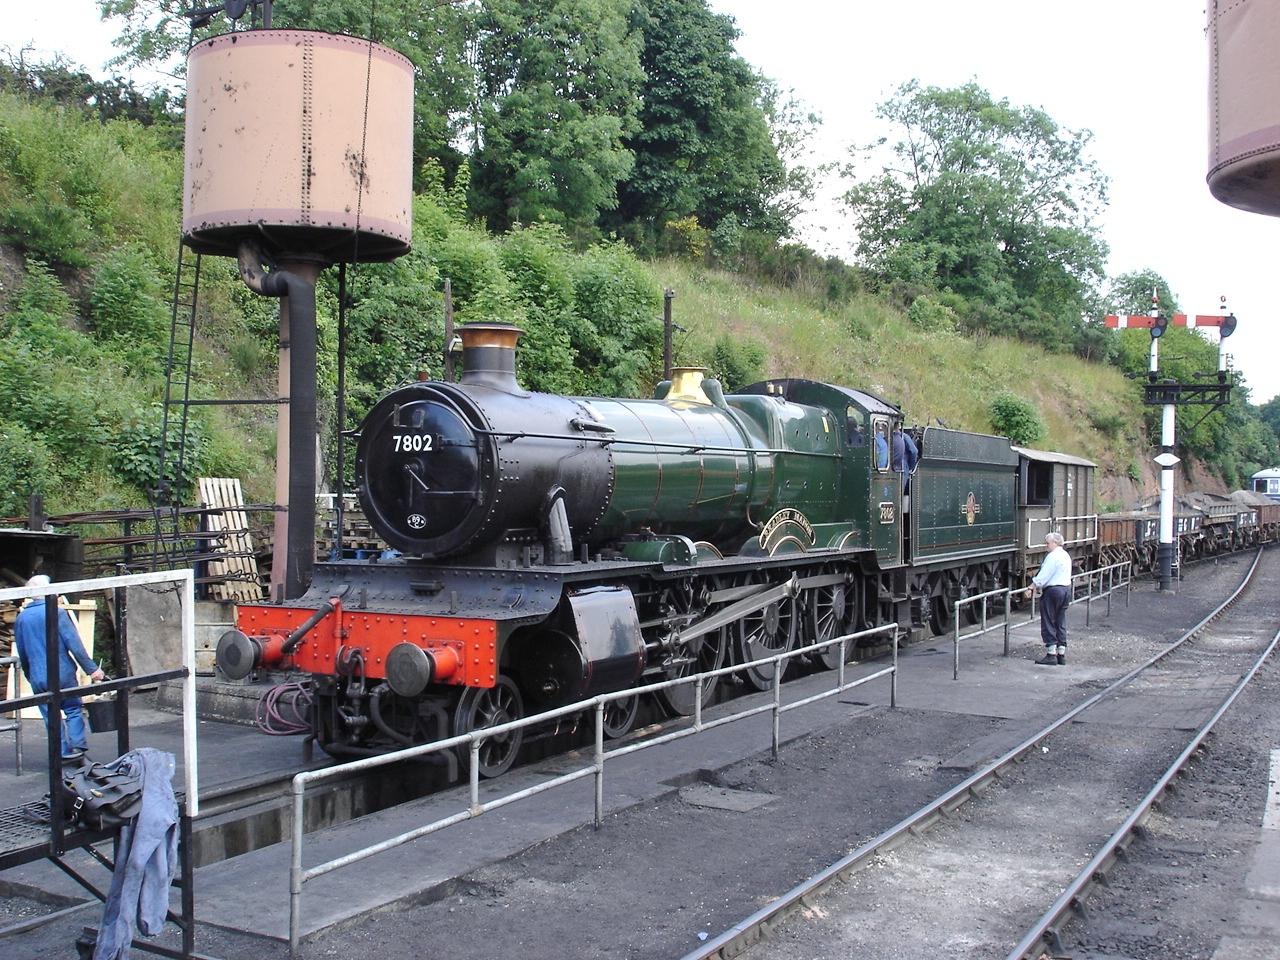 File:GWR Class 7800 No 7802 Bradley Manor (8062219919).jpg